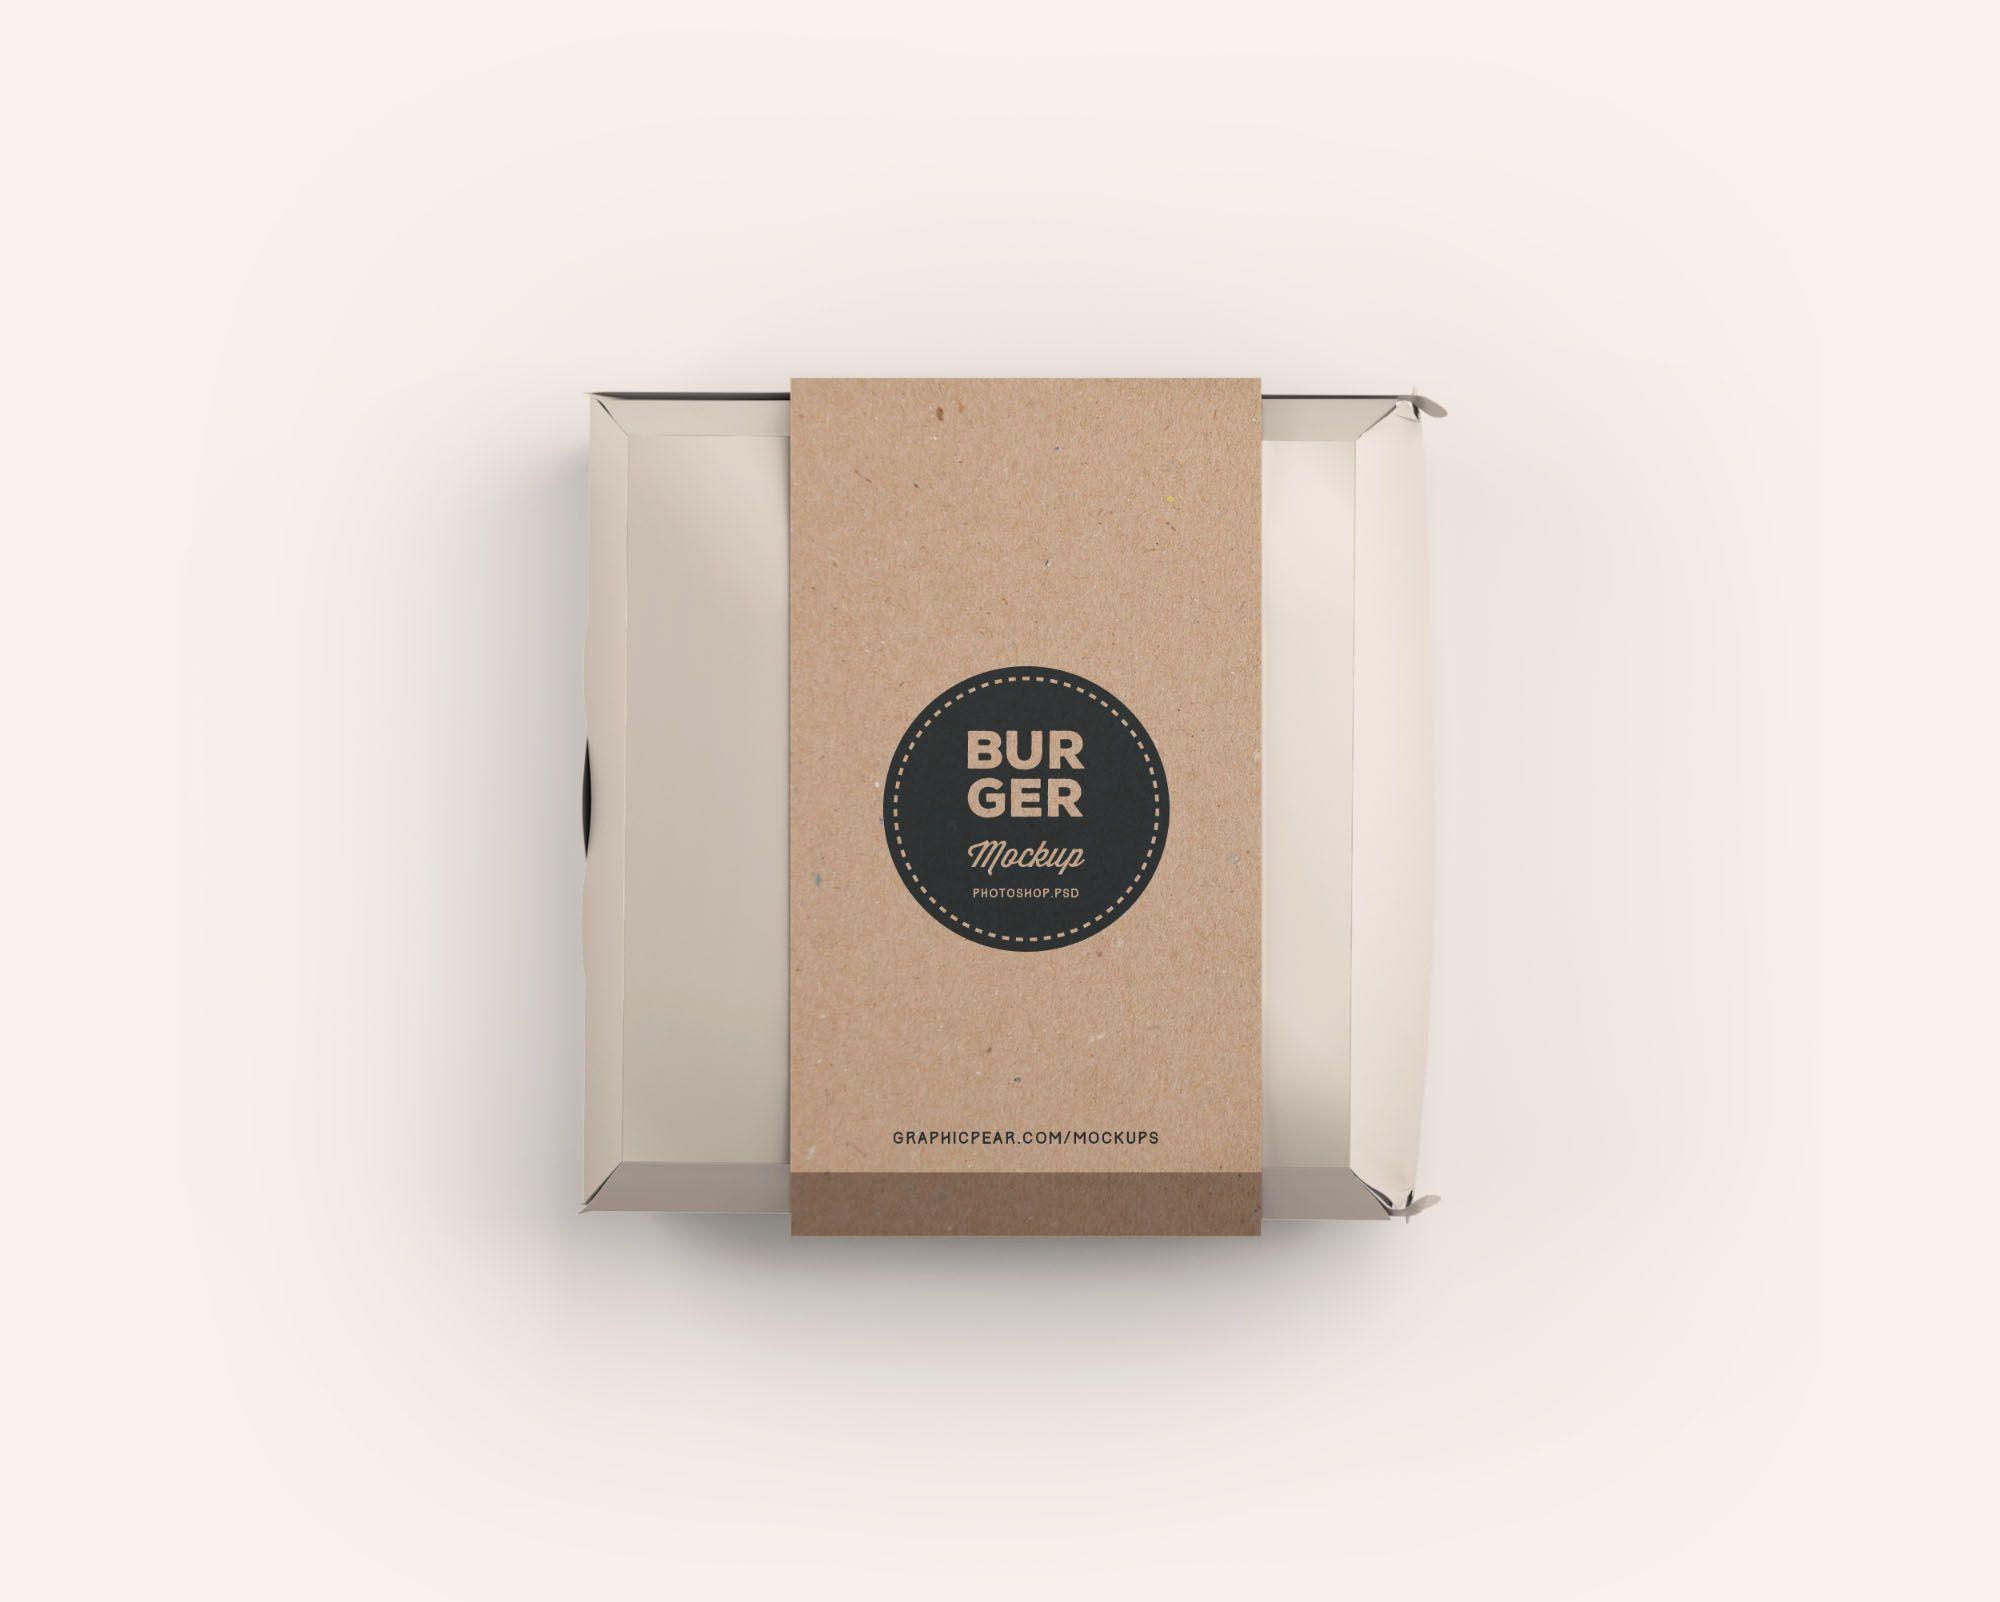 Download Burger Box Package Mockup Apemockups